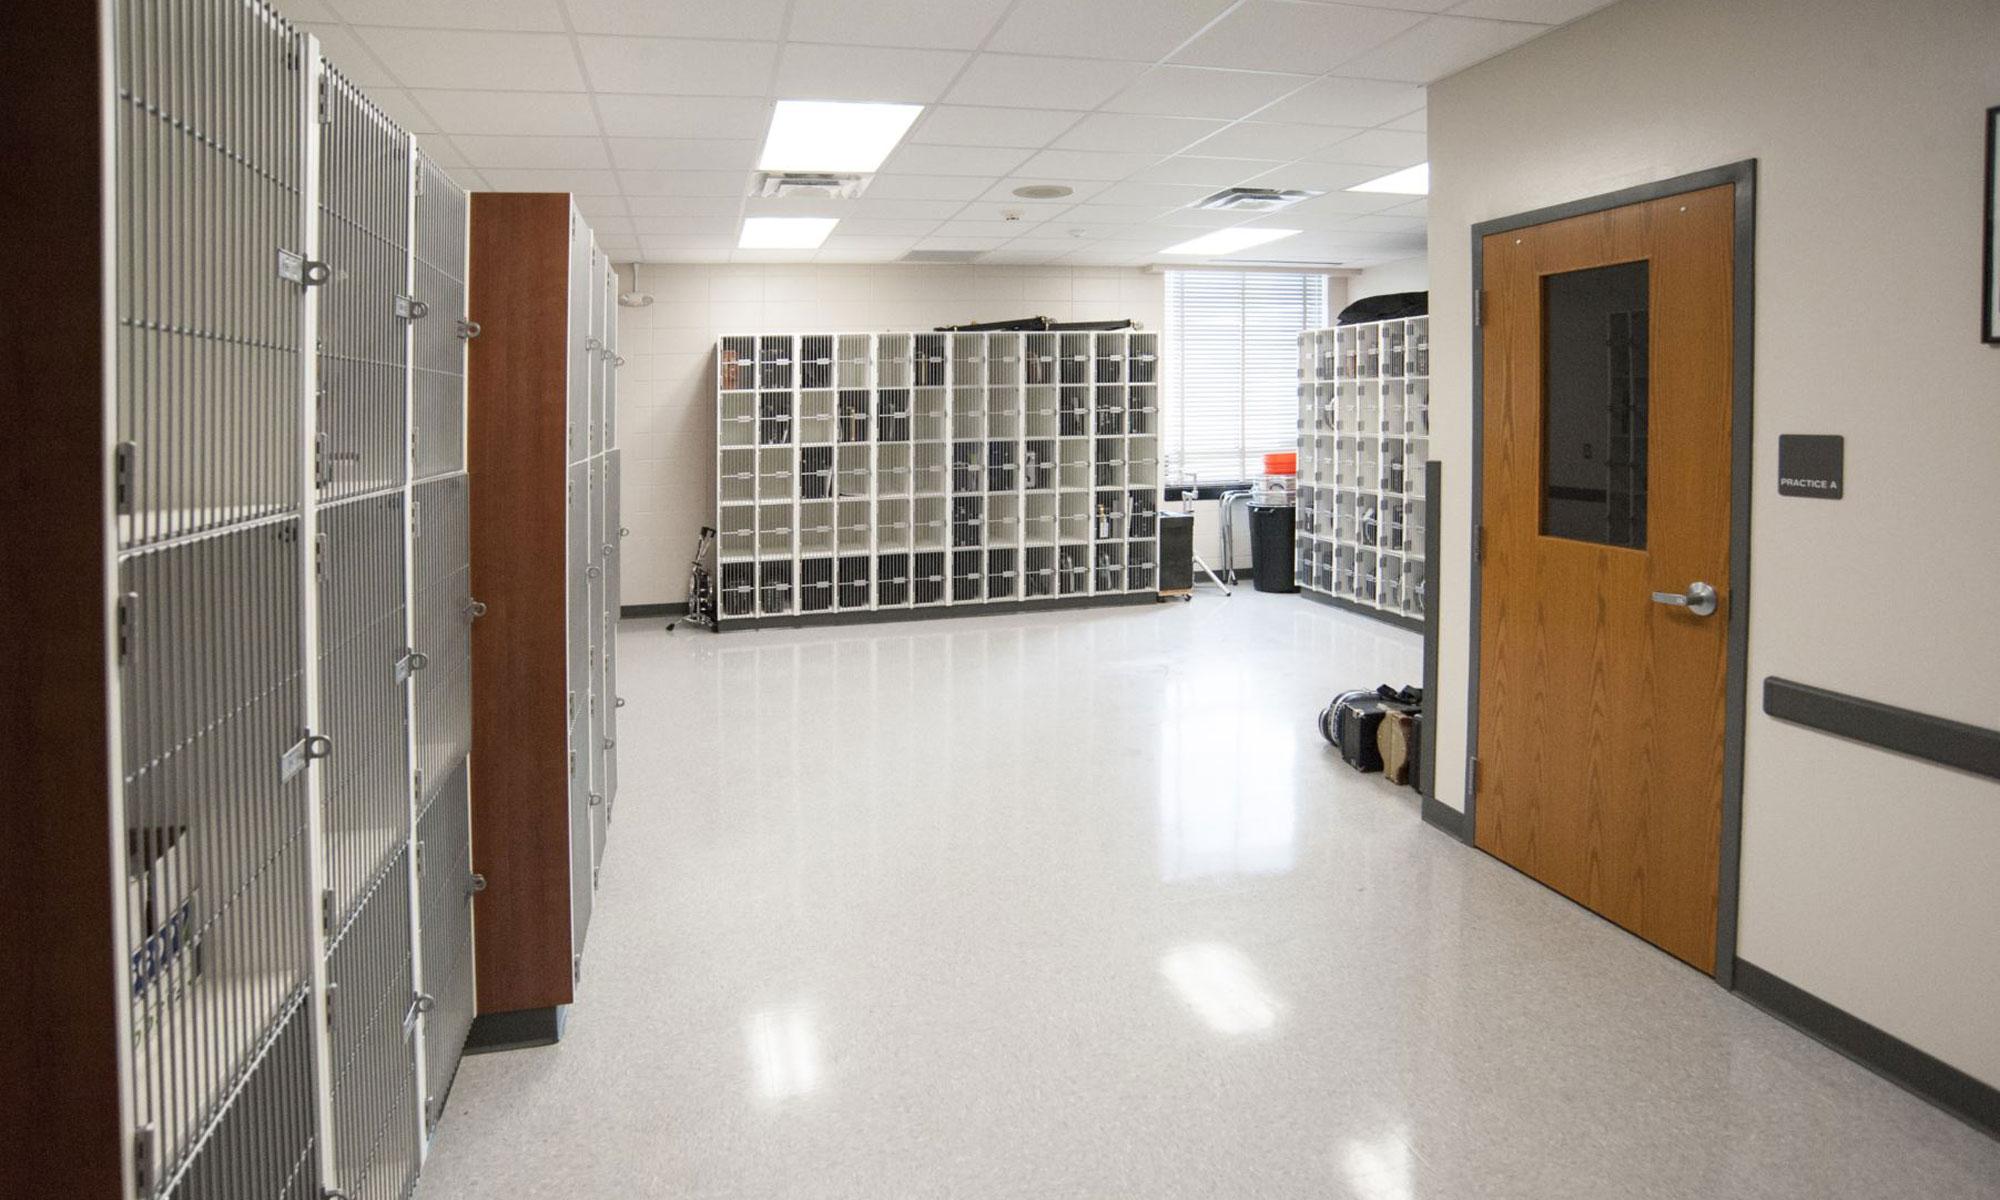 Jefferson Middle School Interior 2